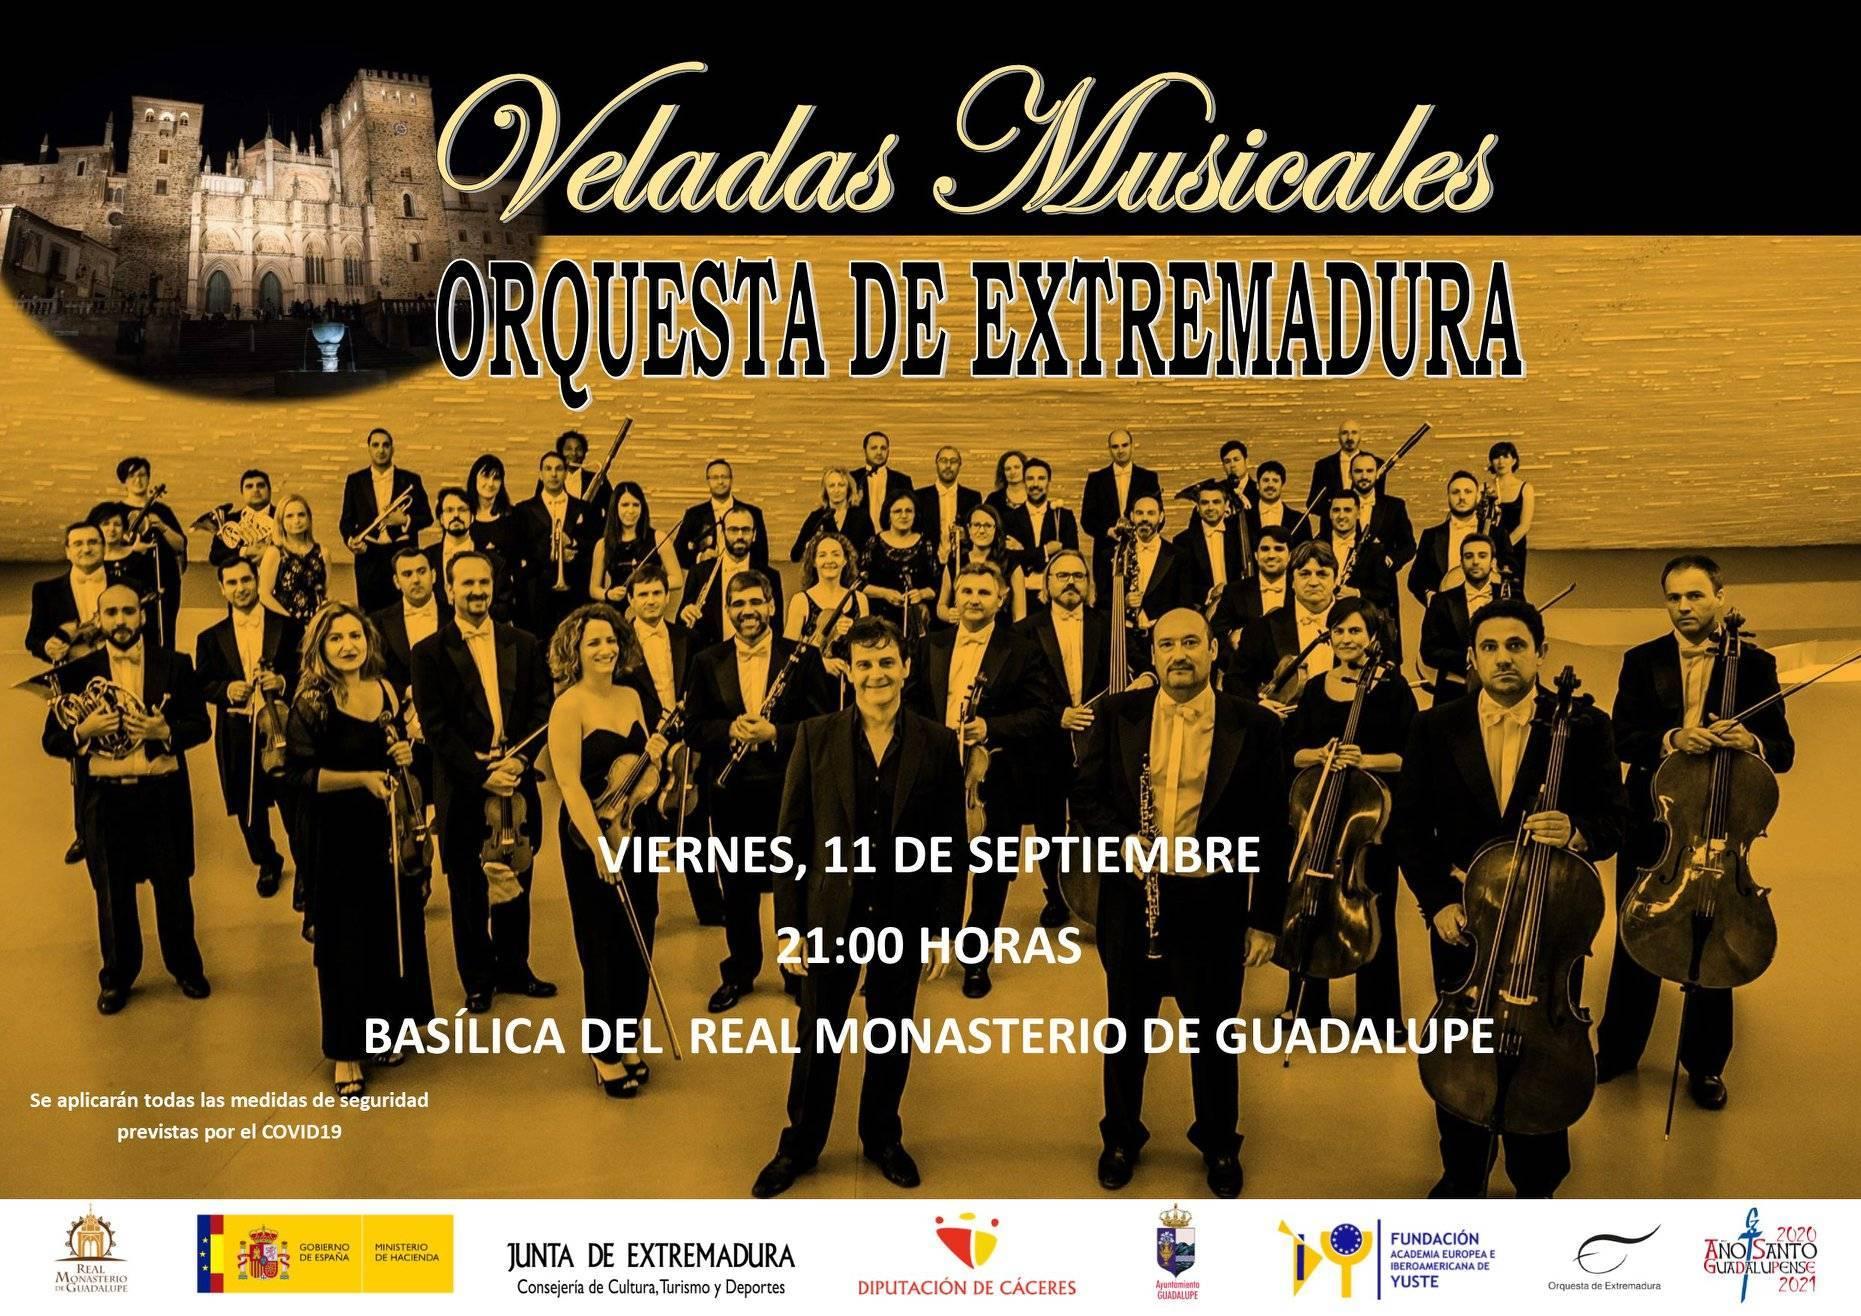 Orquesta de Extremadura (2020) - Guadalupe (Cáceres)